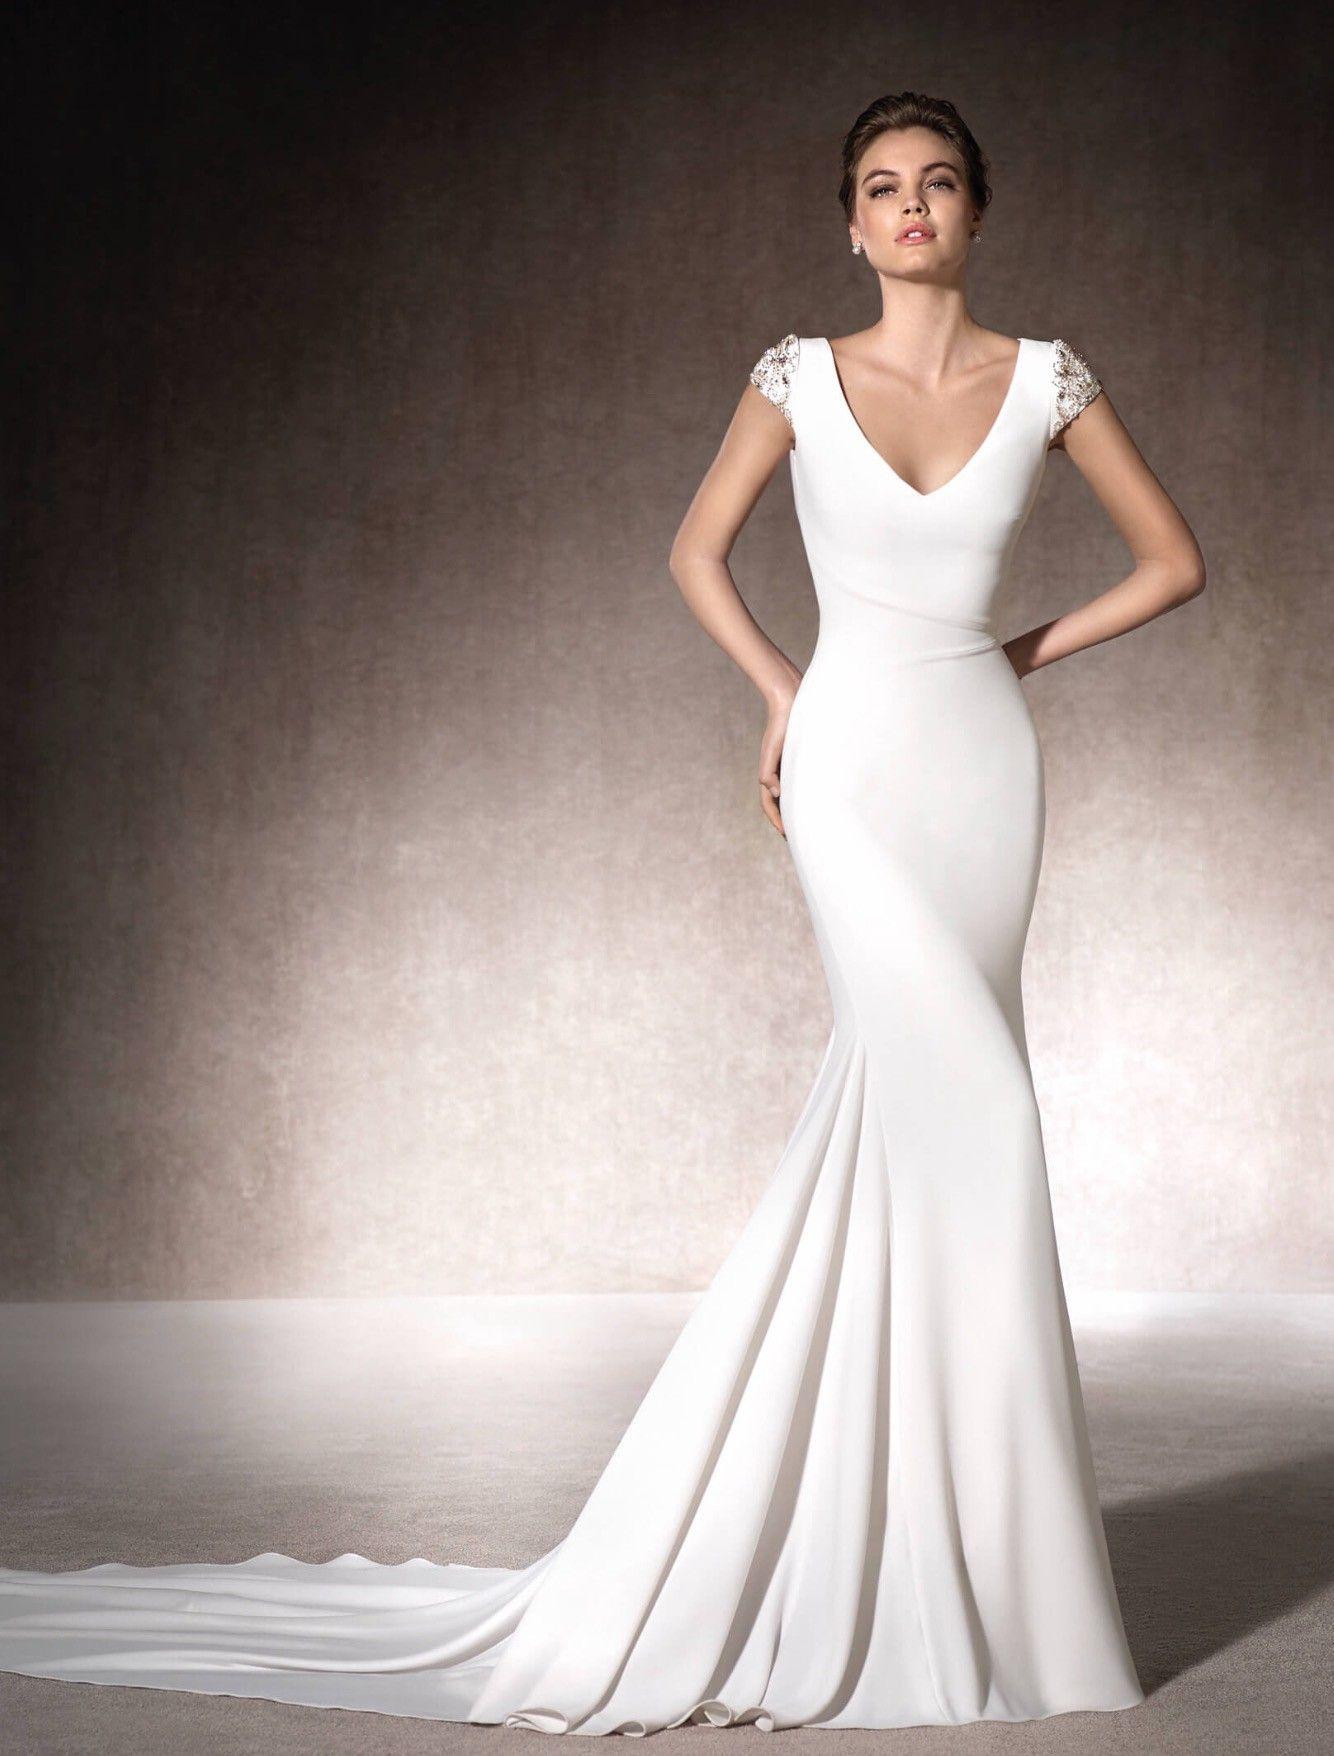 San patrick new melia size 10 wedding dress san patrick san patrick new melia size 10 wedding dress ombrellifo Images